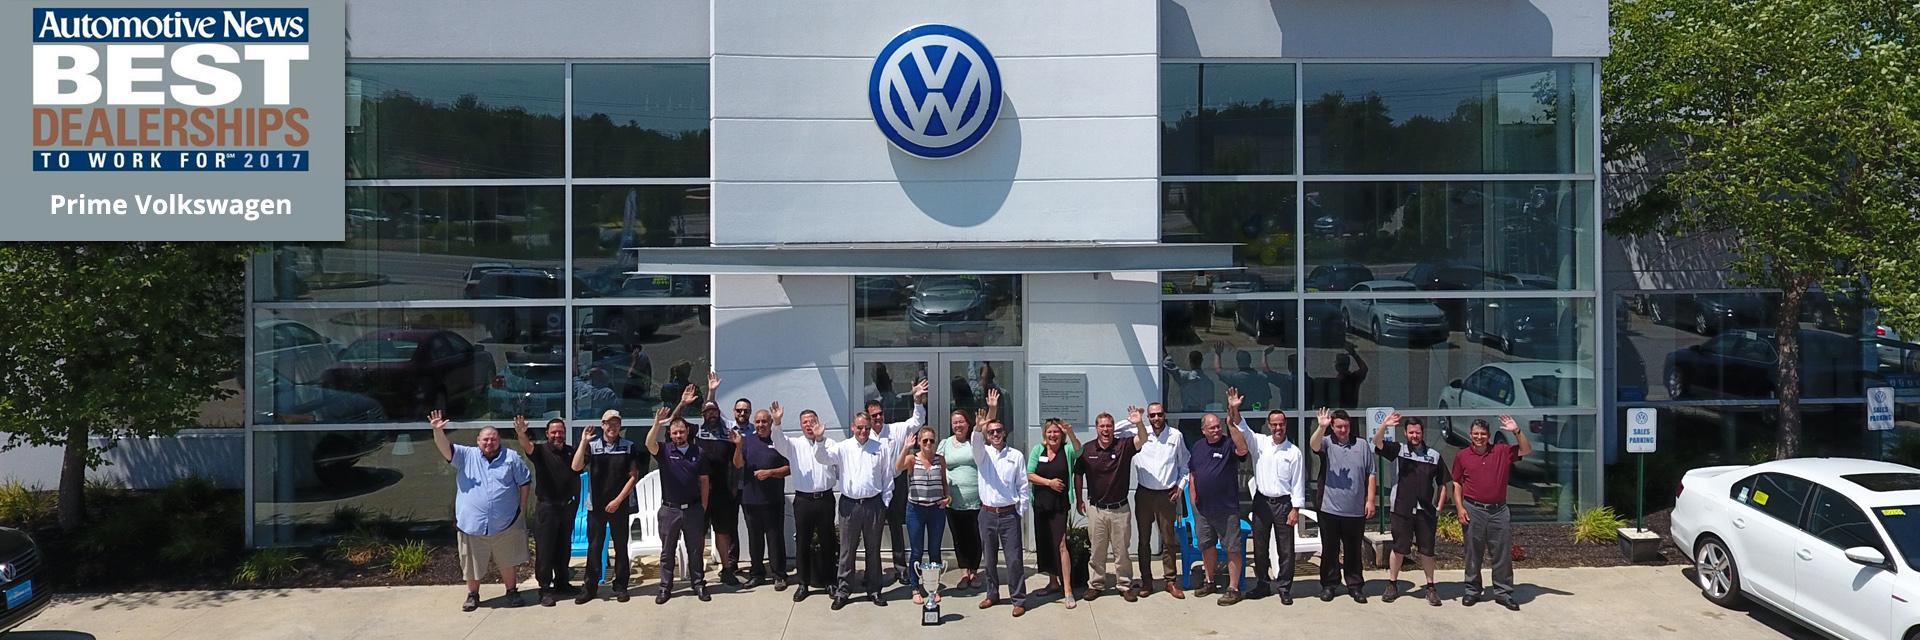 Prime Volkswagen Dealership Saco Portland Biddeford